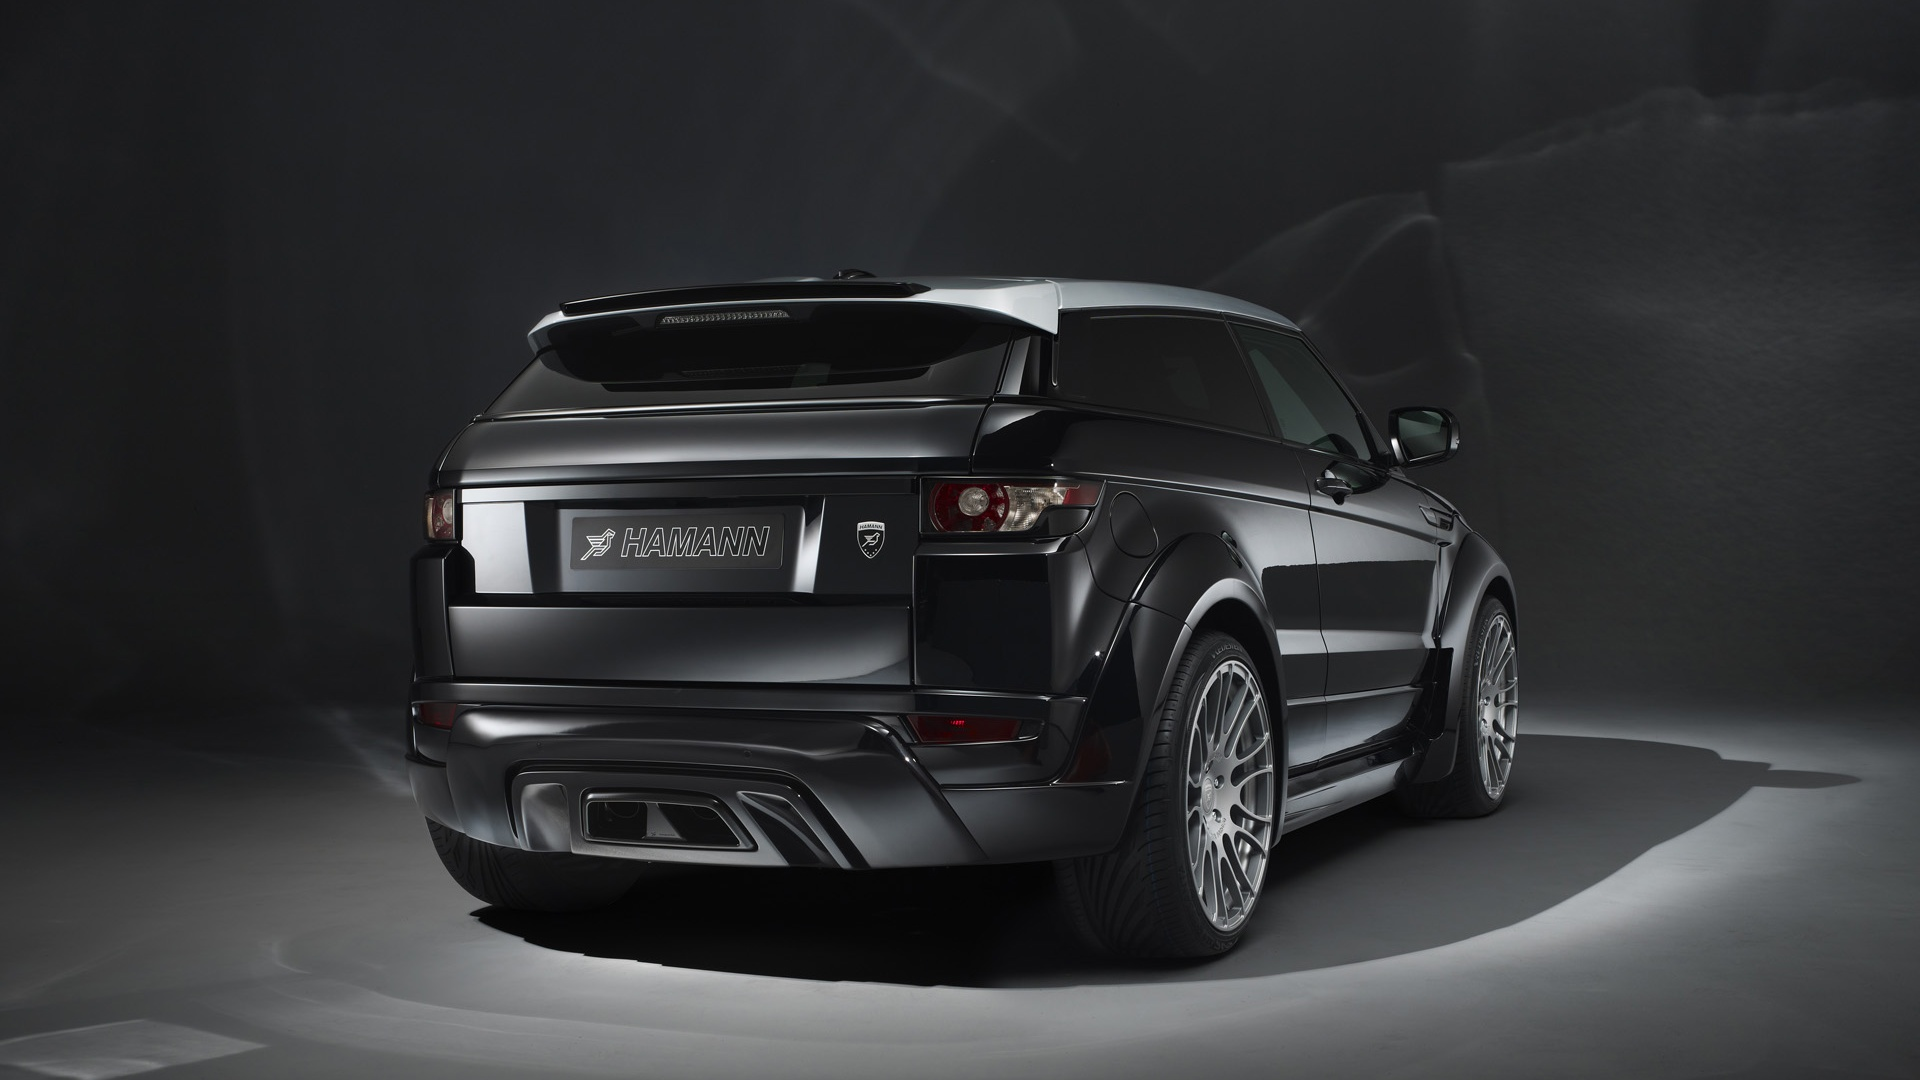 hamann range rover evoque studio rear full hd desktop. Black Bedroom Furniture Sets. Home Design Ideas